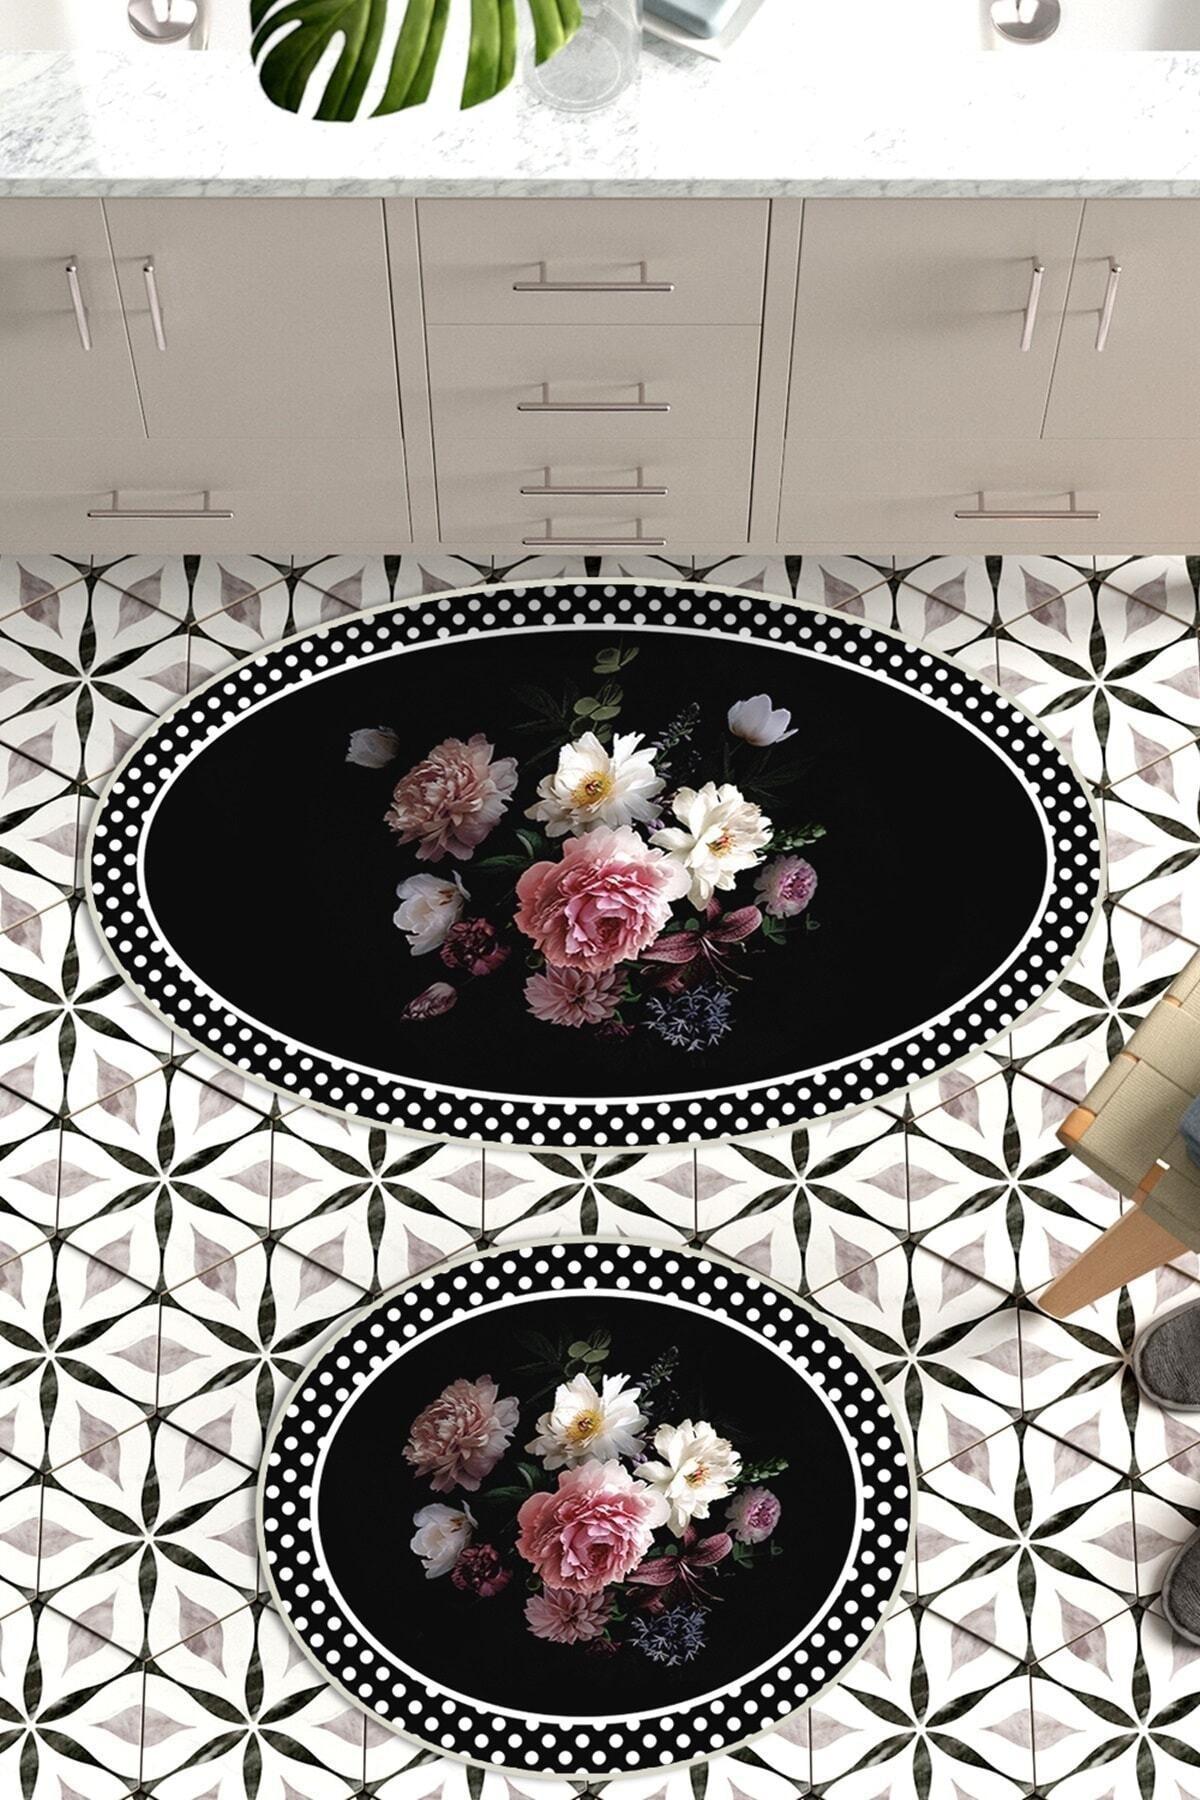 colizon 60x90 - 50x60 Rose&Black Banyo Halısı Oval Klozet Takımı 2'li Paspas Seti 1